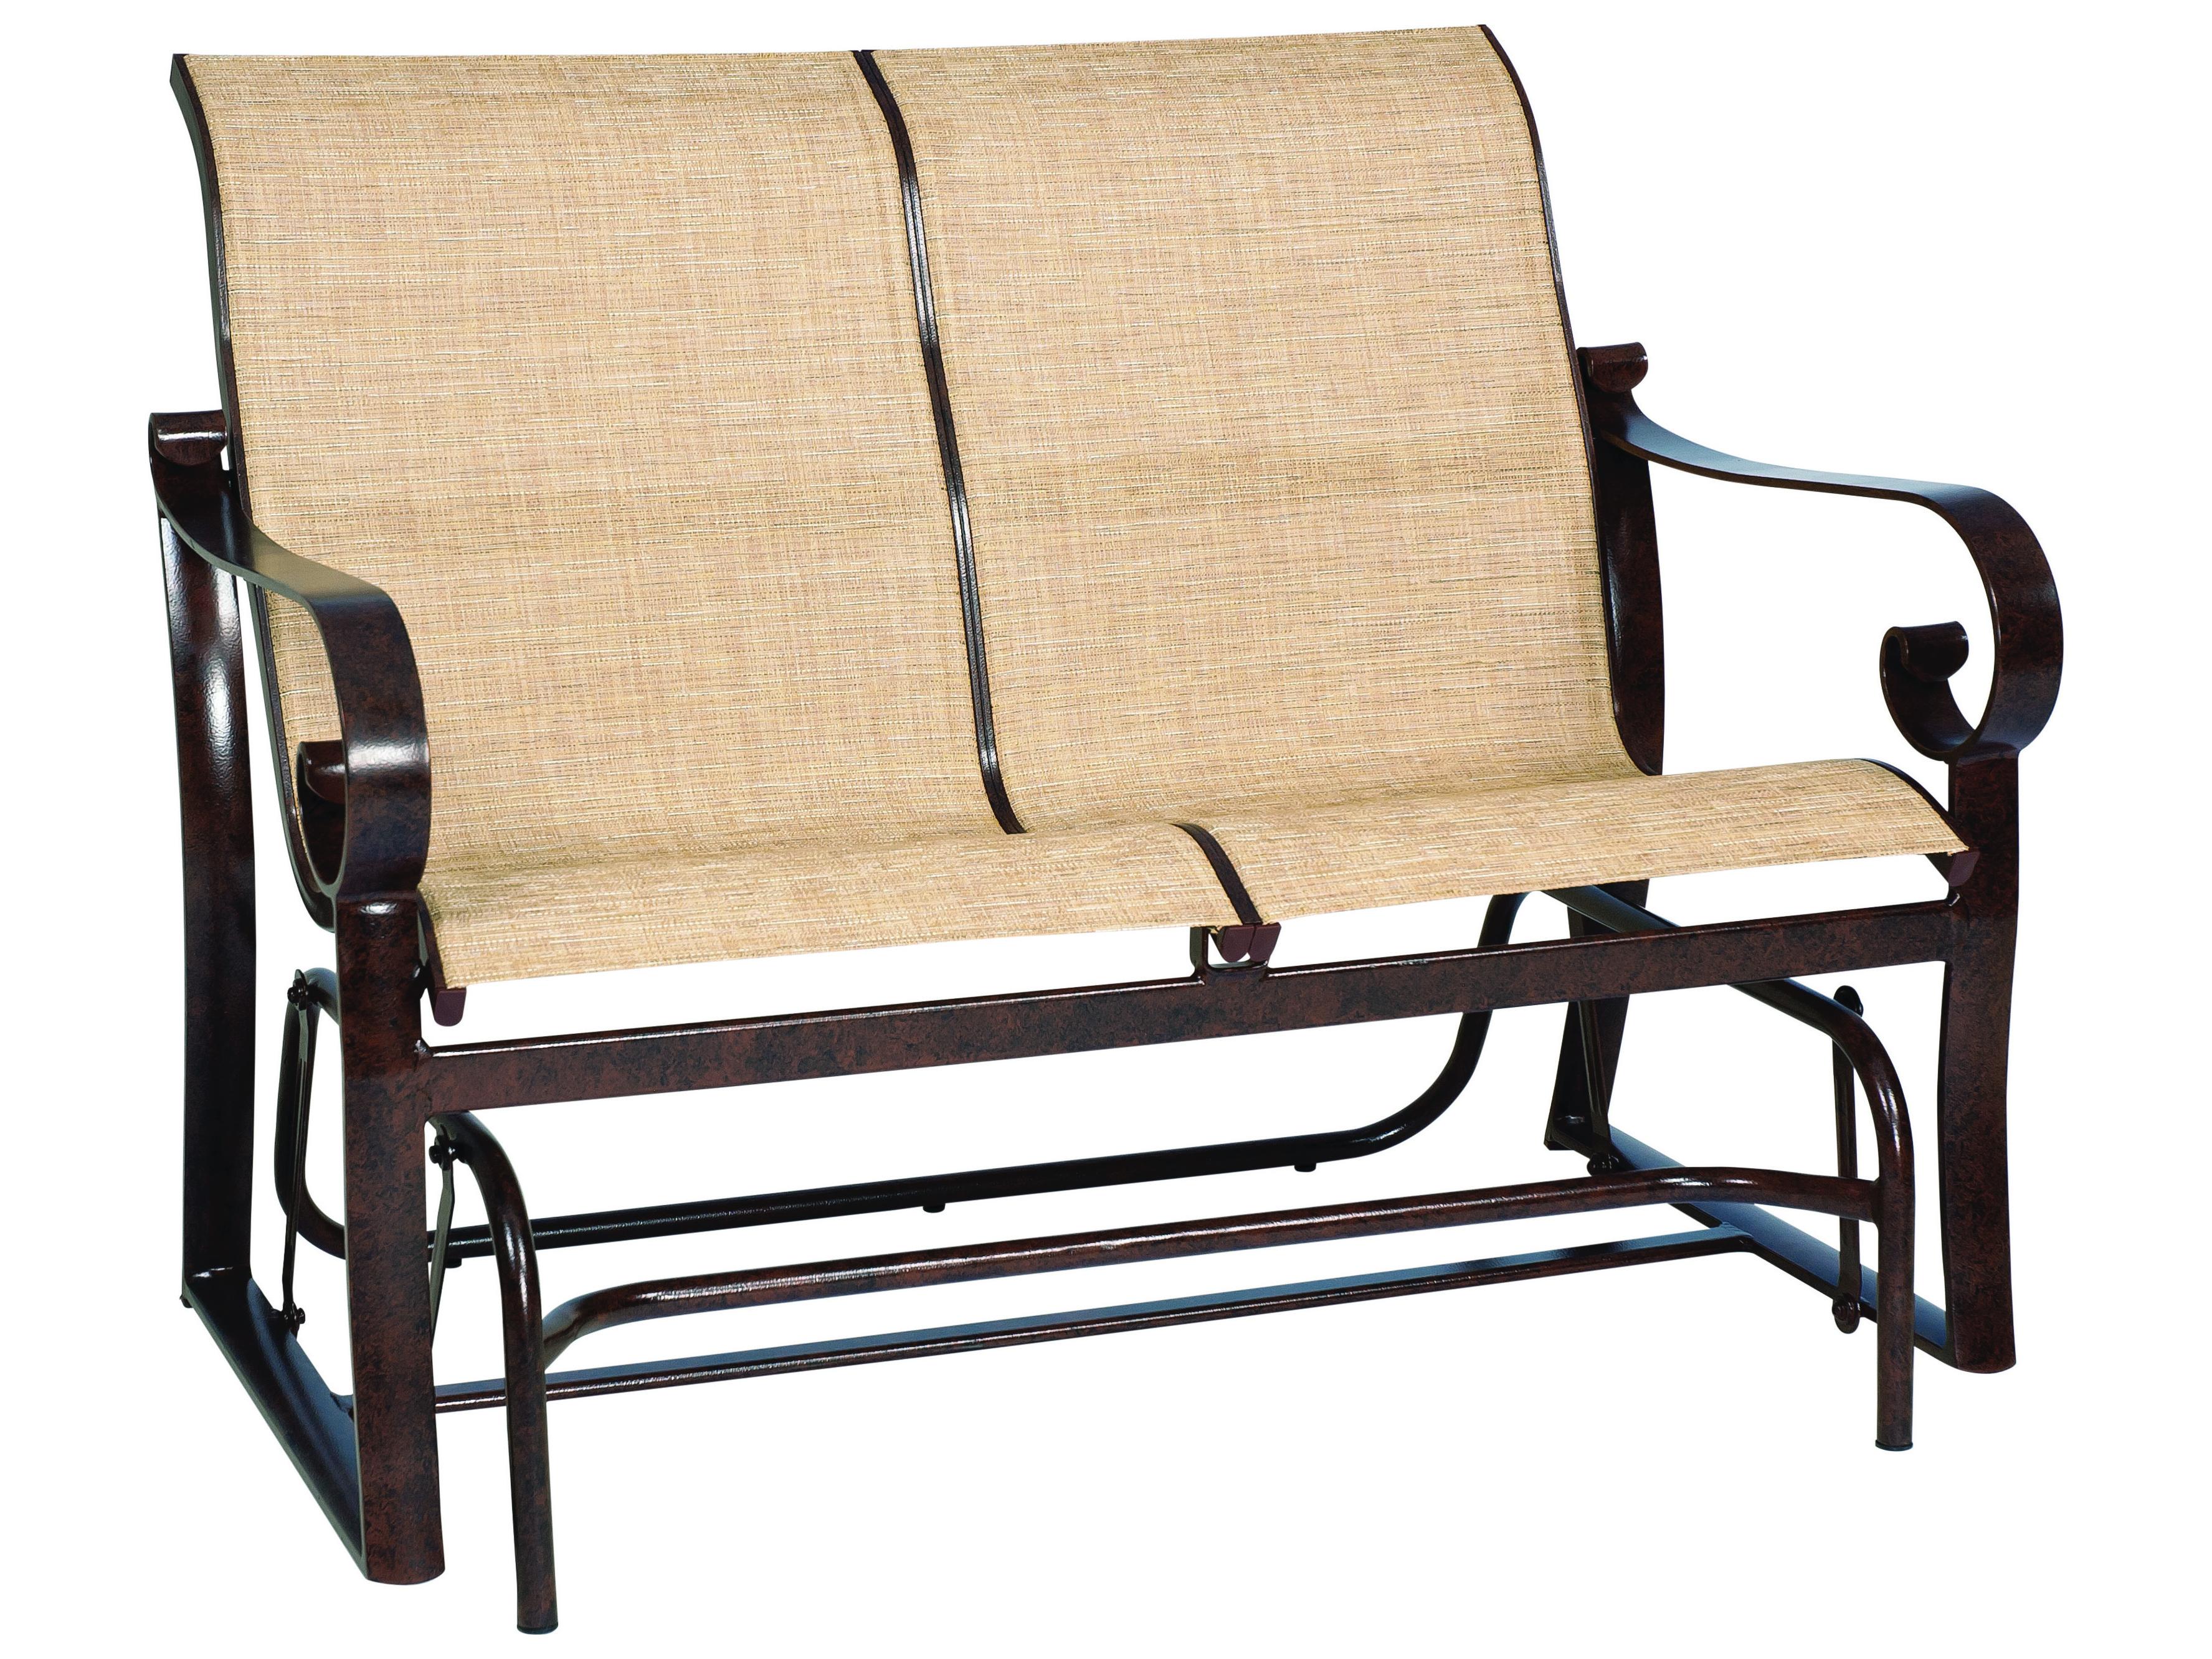 Winston Southern Cay Sling Aluminum Armless Chaise Lounge: Woodard Belden Sling Aluminum Glider Loveseat